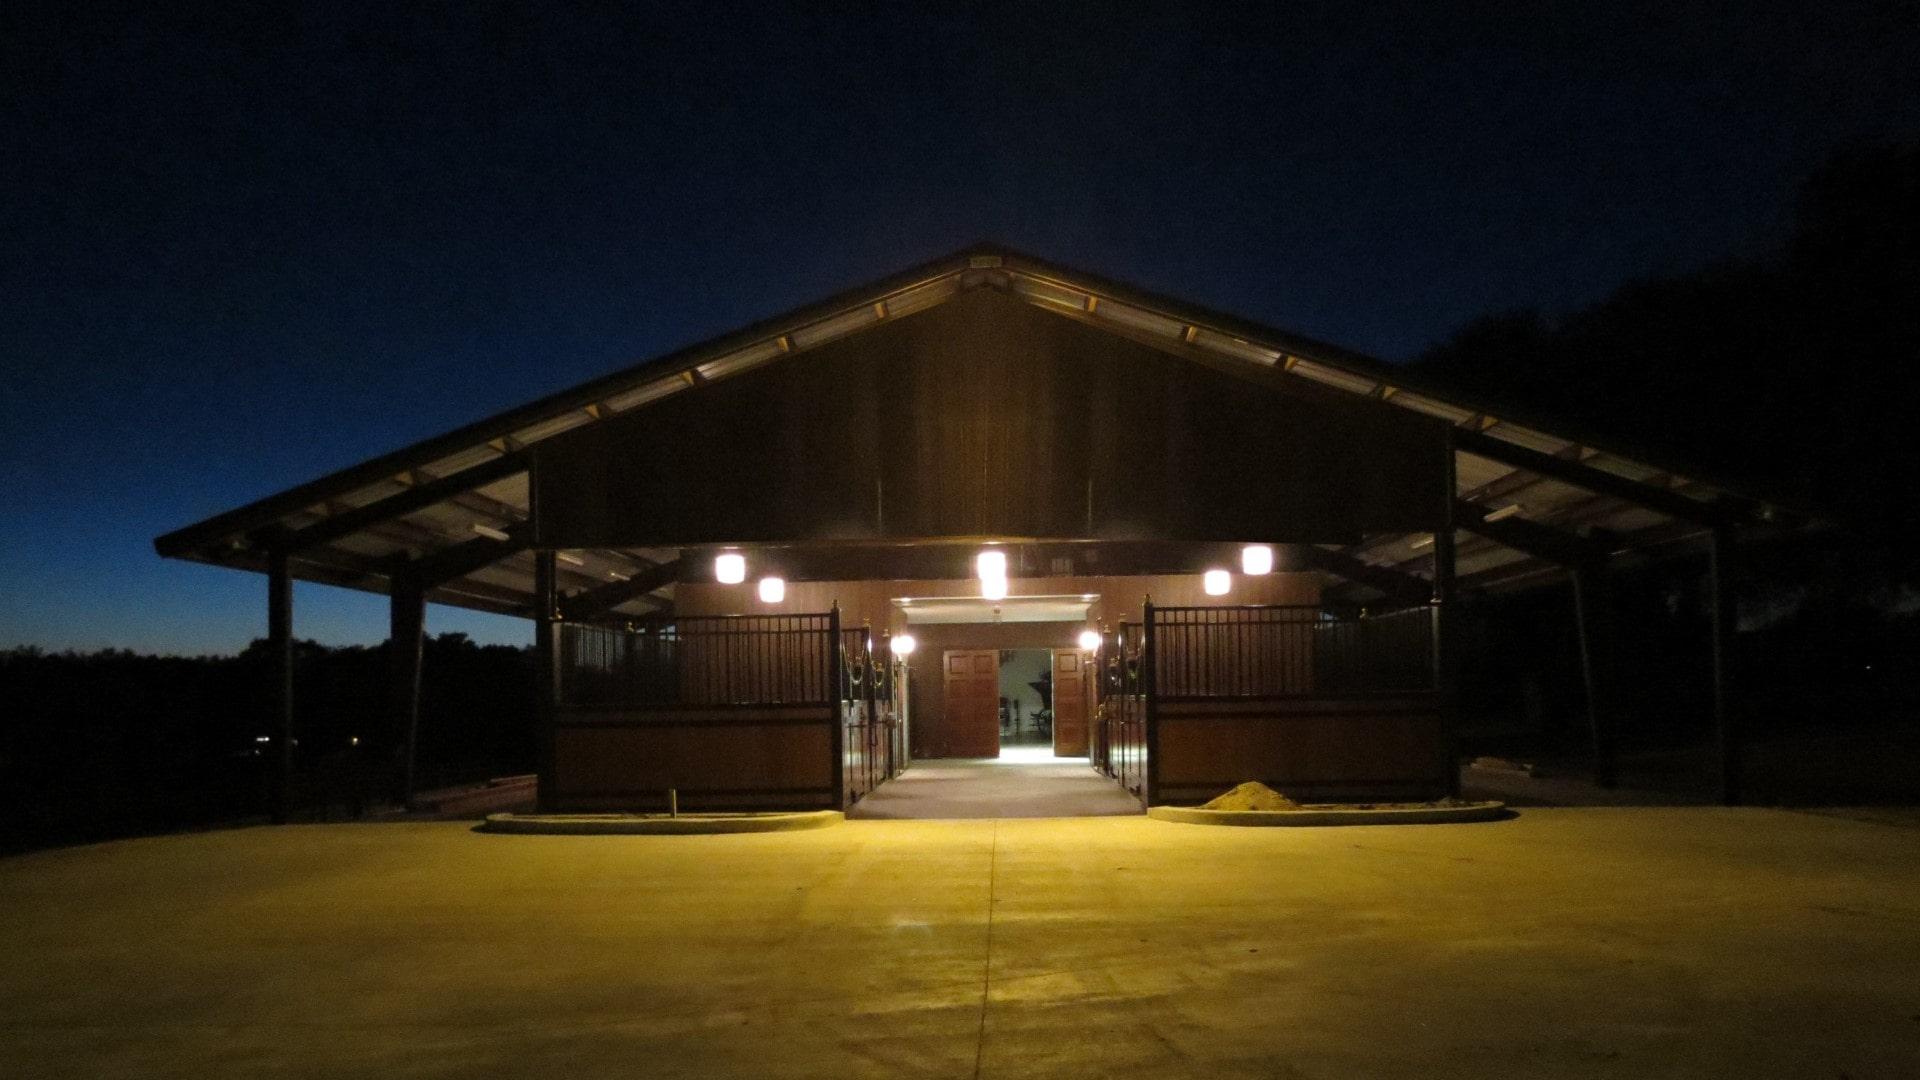 Custom horse barn exterior view of stalls at night with decorative lighting illuminating custom stalls.